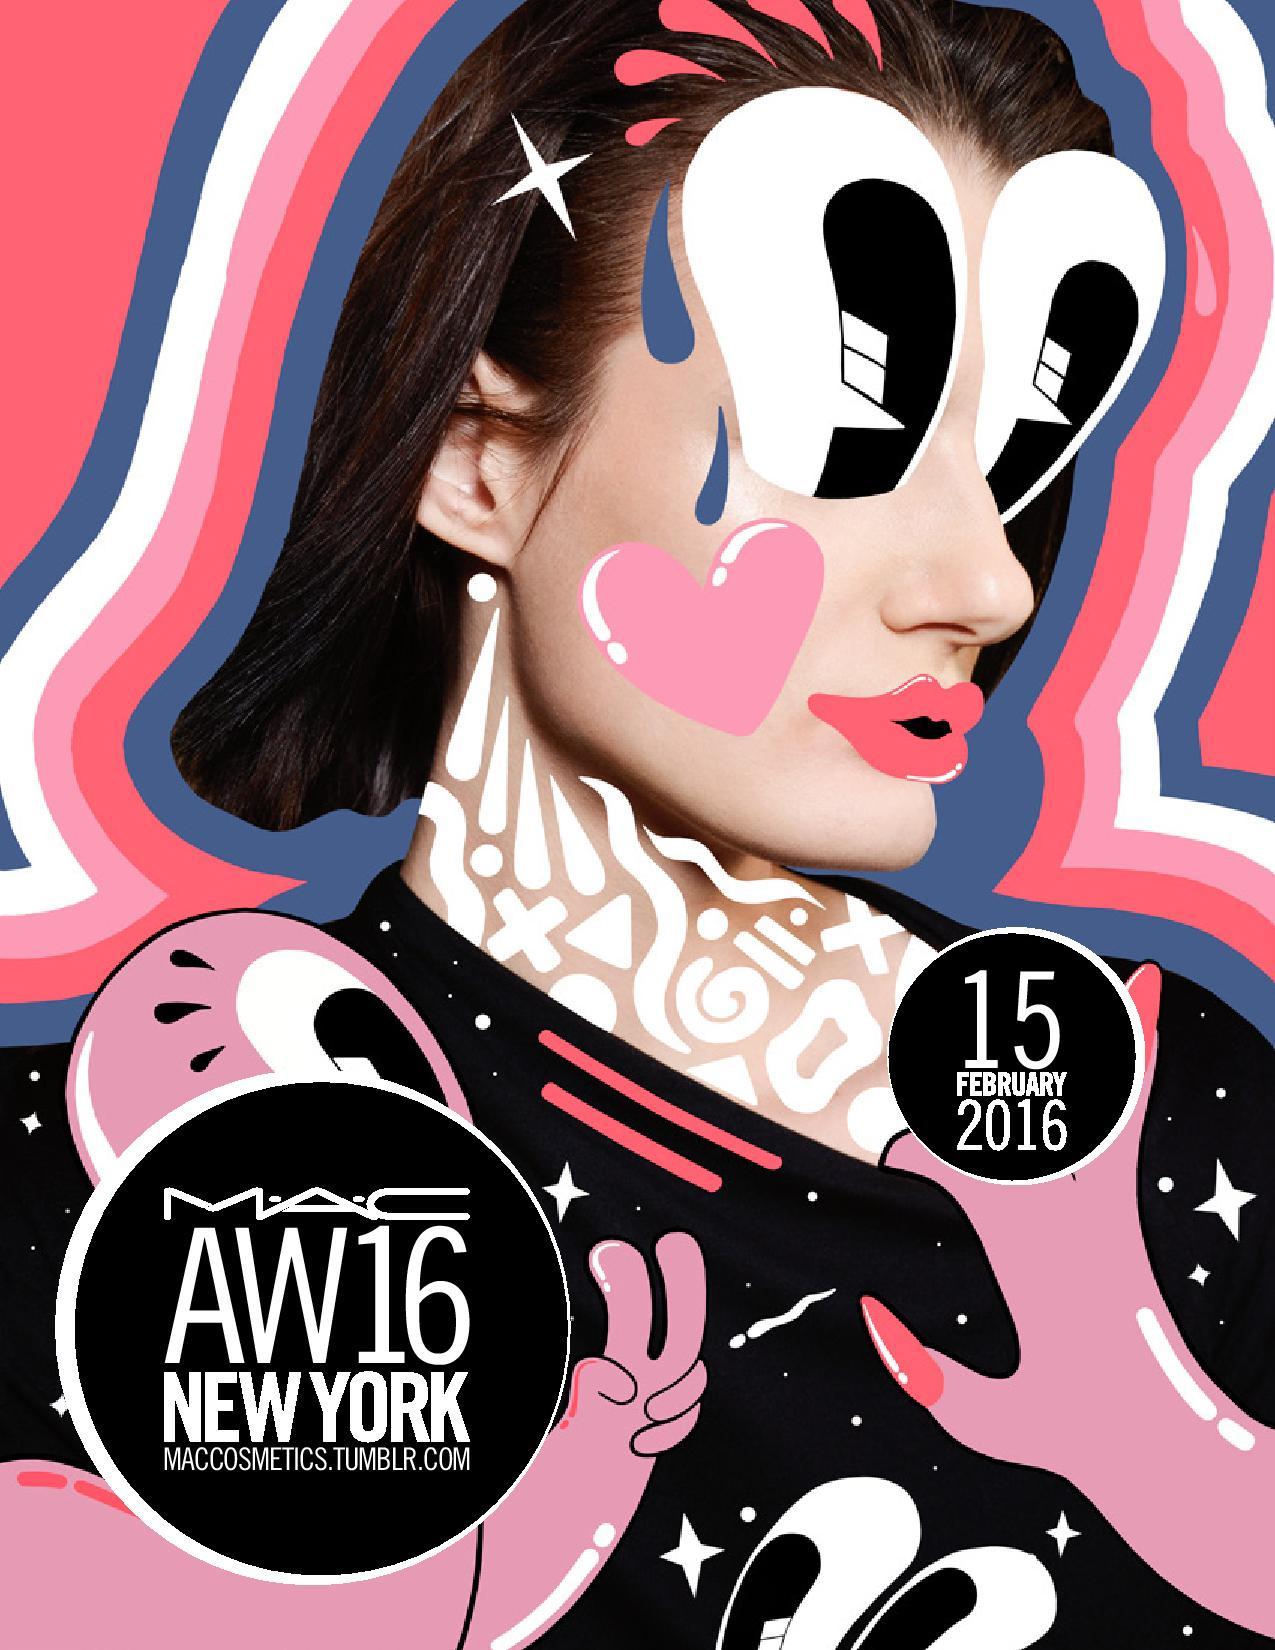 AW16_DAILY FACECHART_NEW YORK_FEB 15 Carolina Herrera, Jeremy Scott, Rag...-page-001